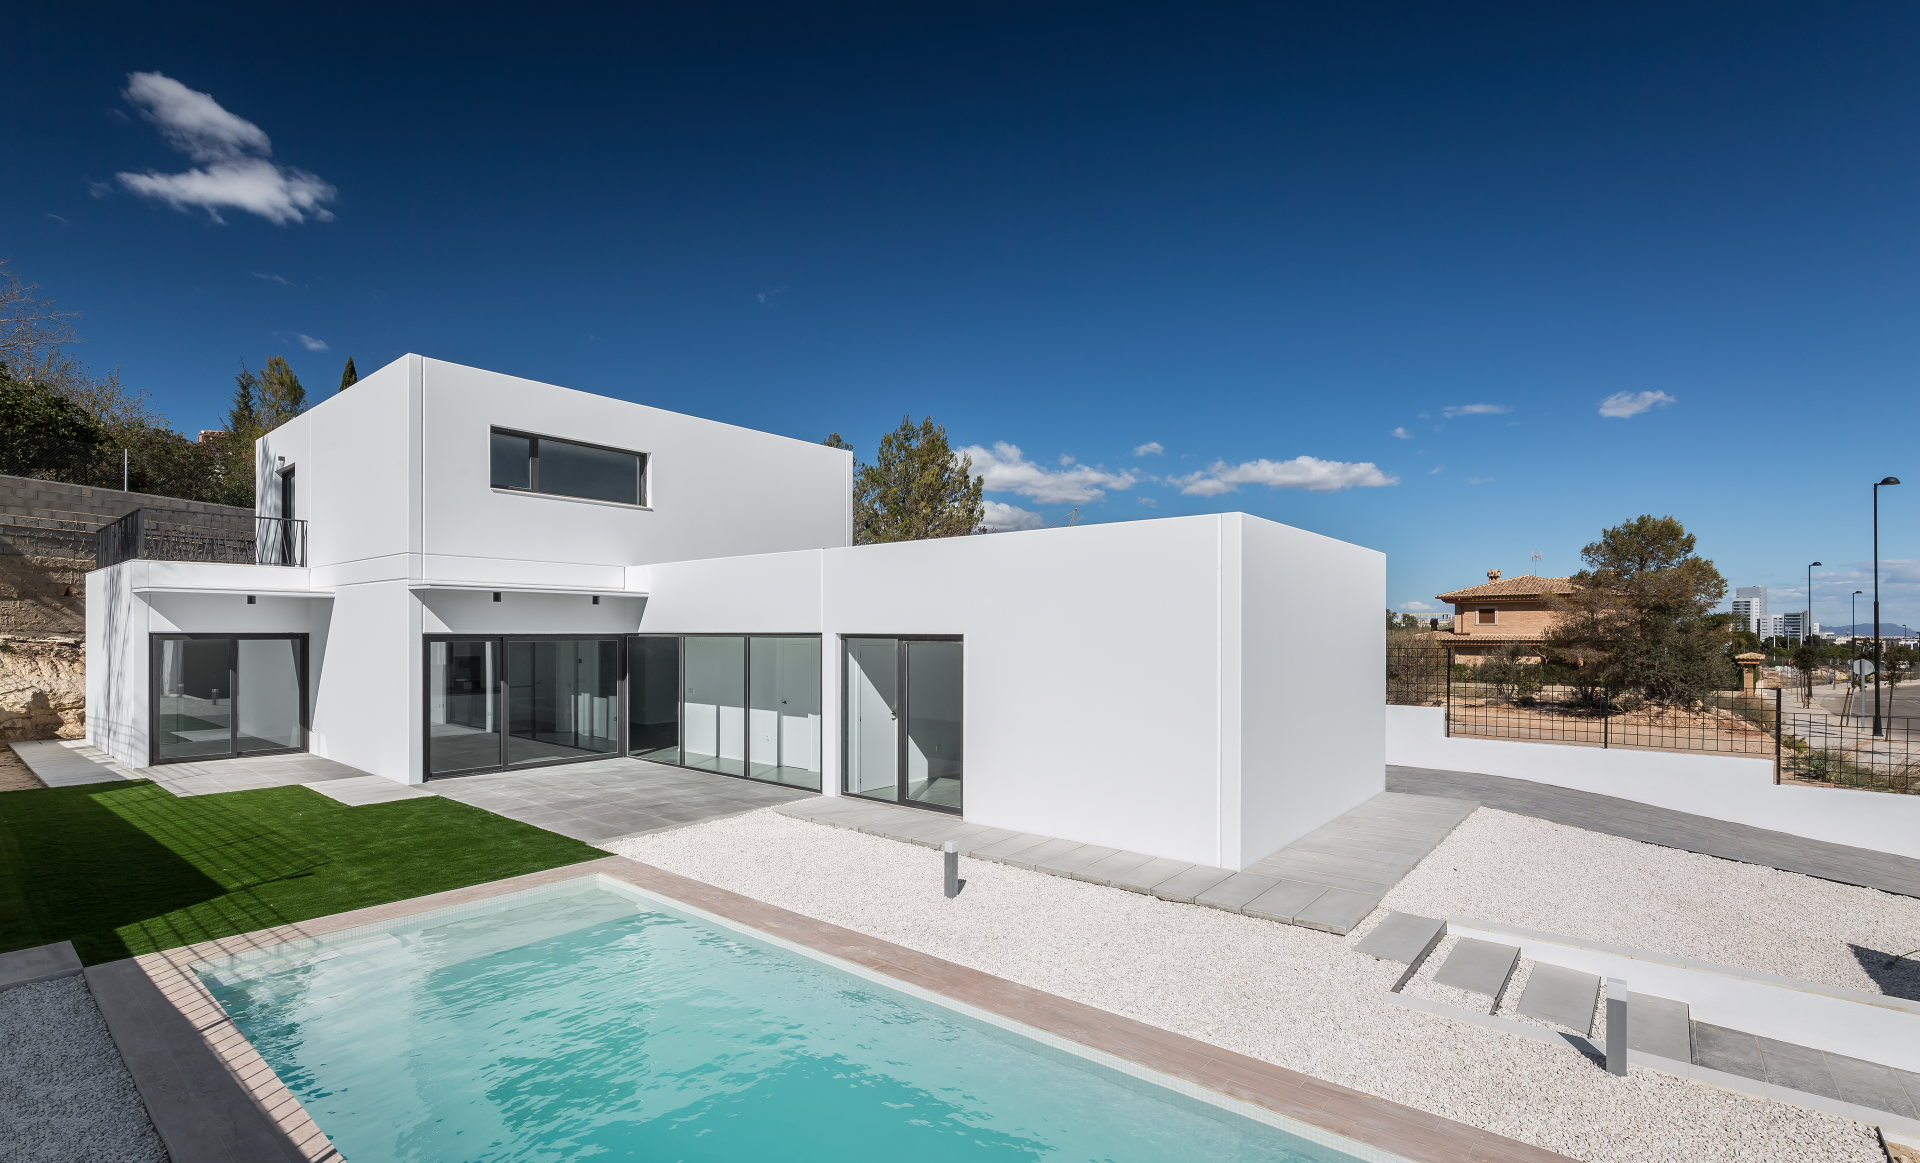 fotografia-arquitectura-valencia-german-cabo-viraje-el-vedat-torrent (4)